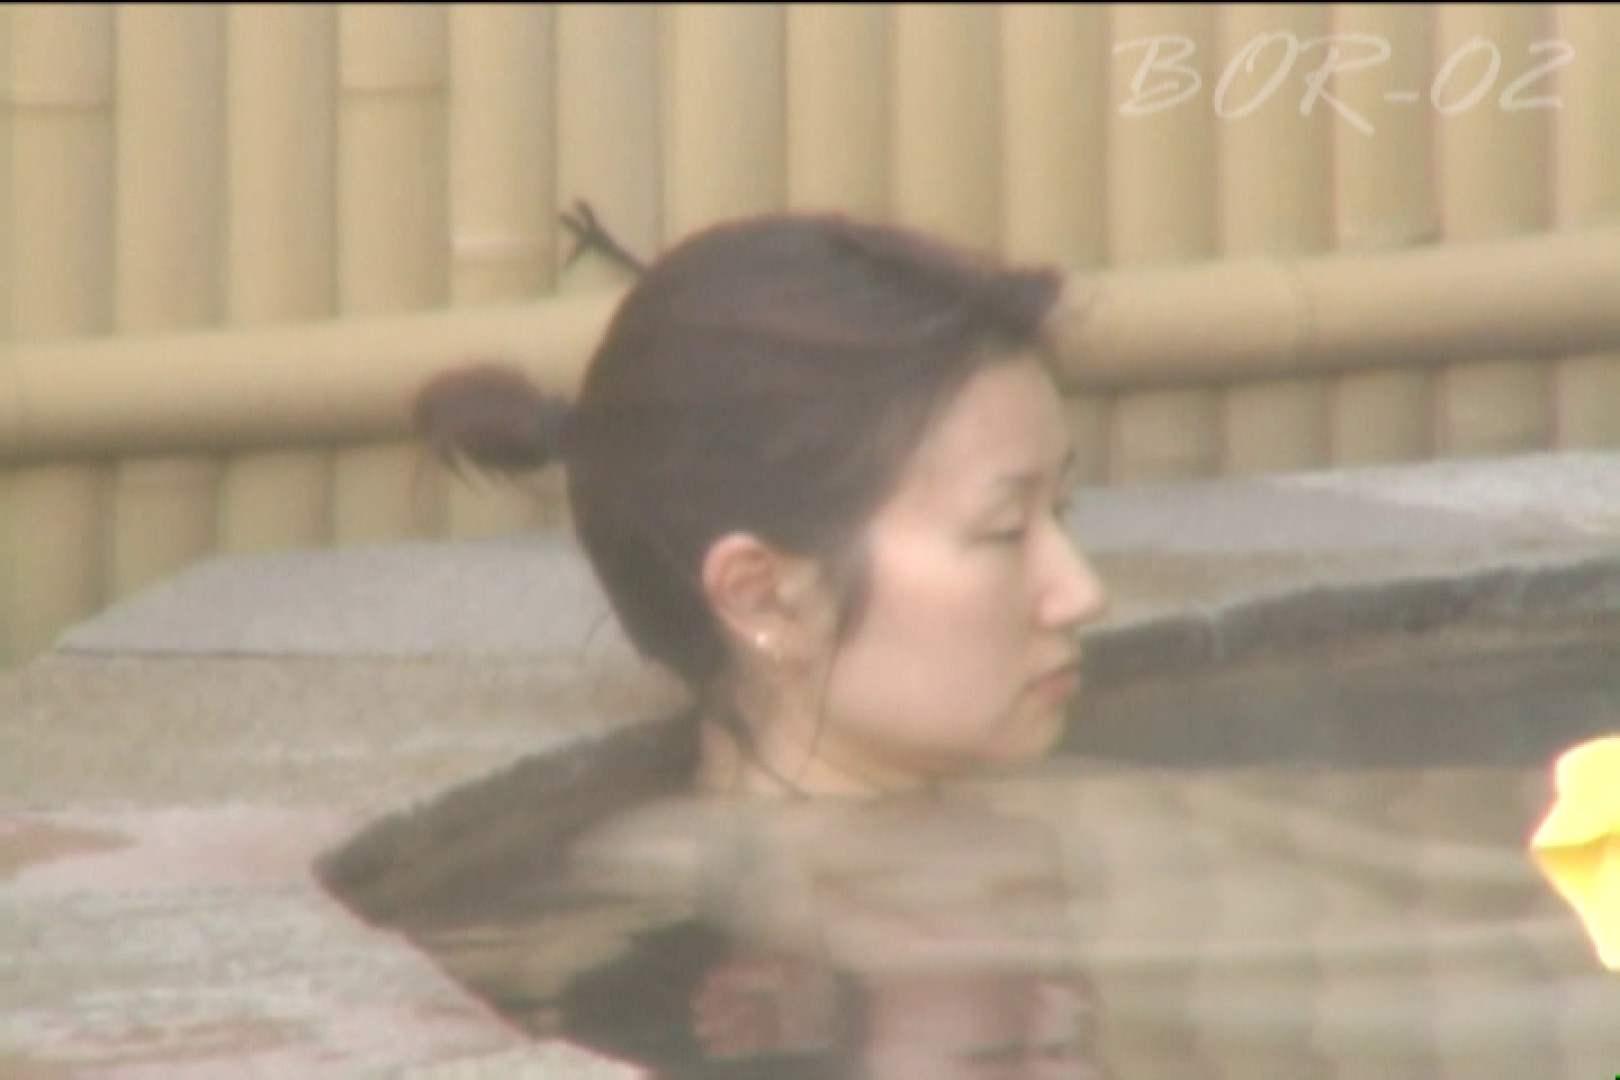 Aquaな露天風呂Vol.477 露天 アダルト動画キャプチャ 99PICs 68